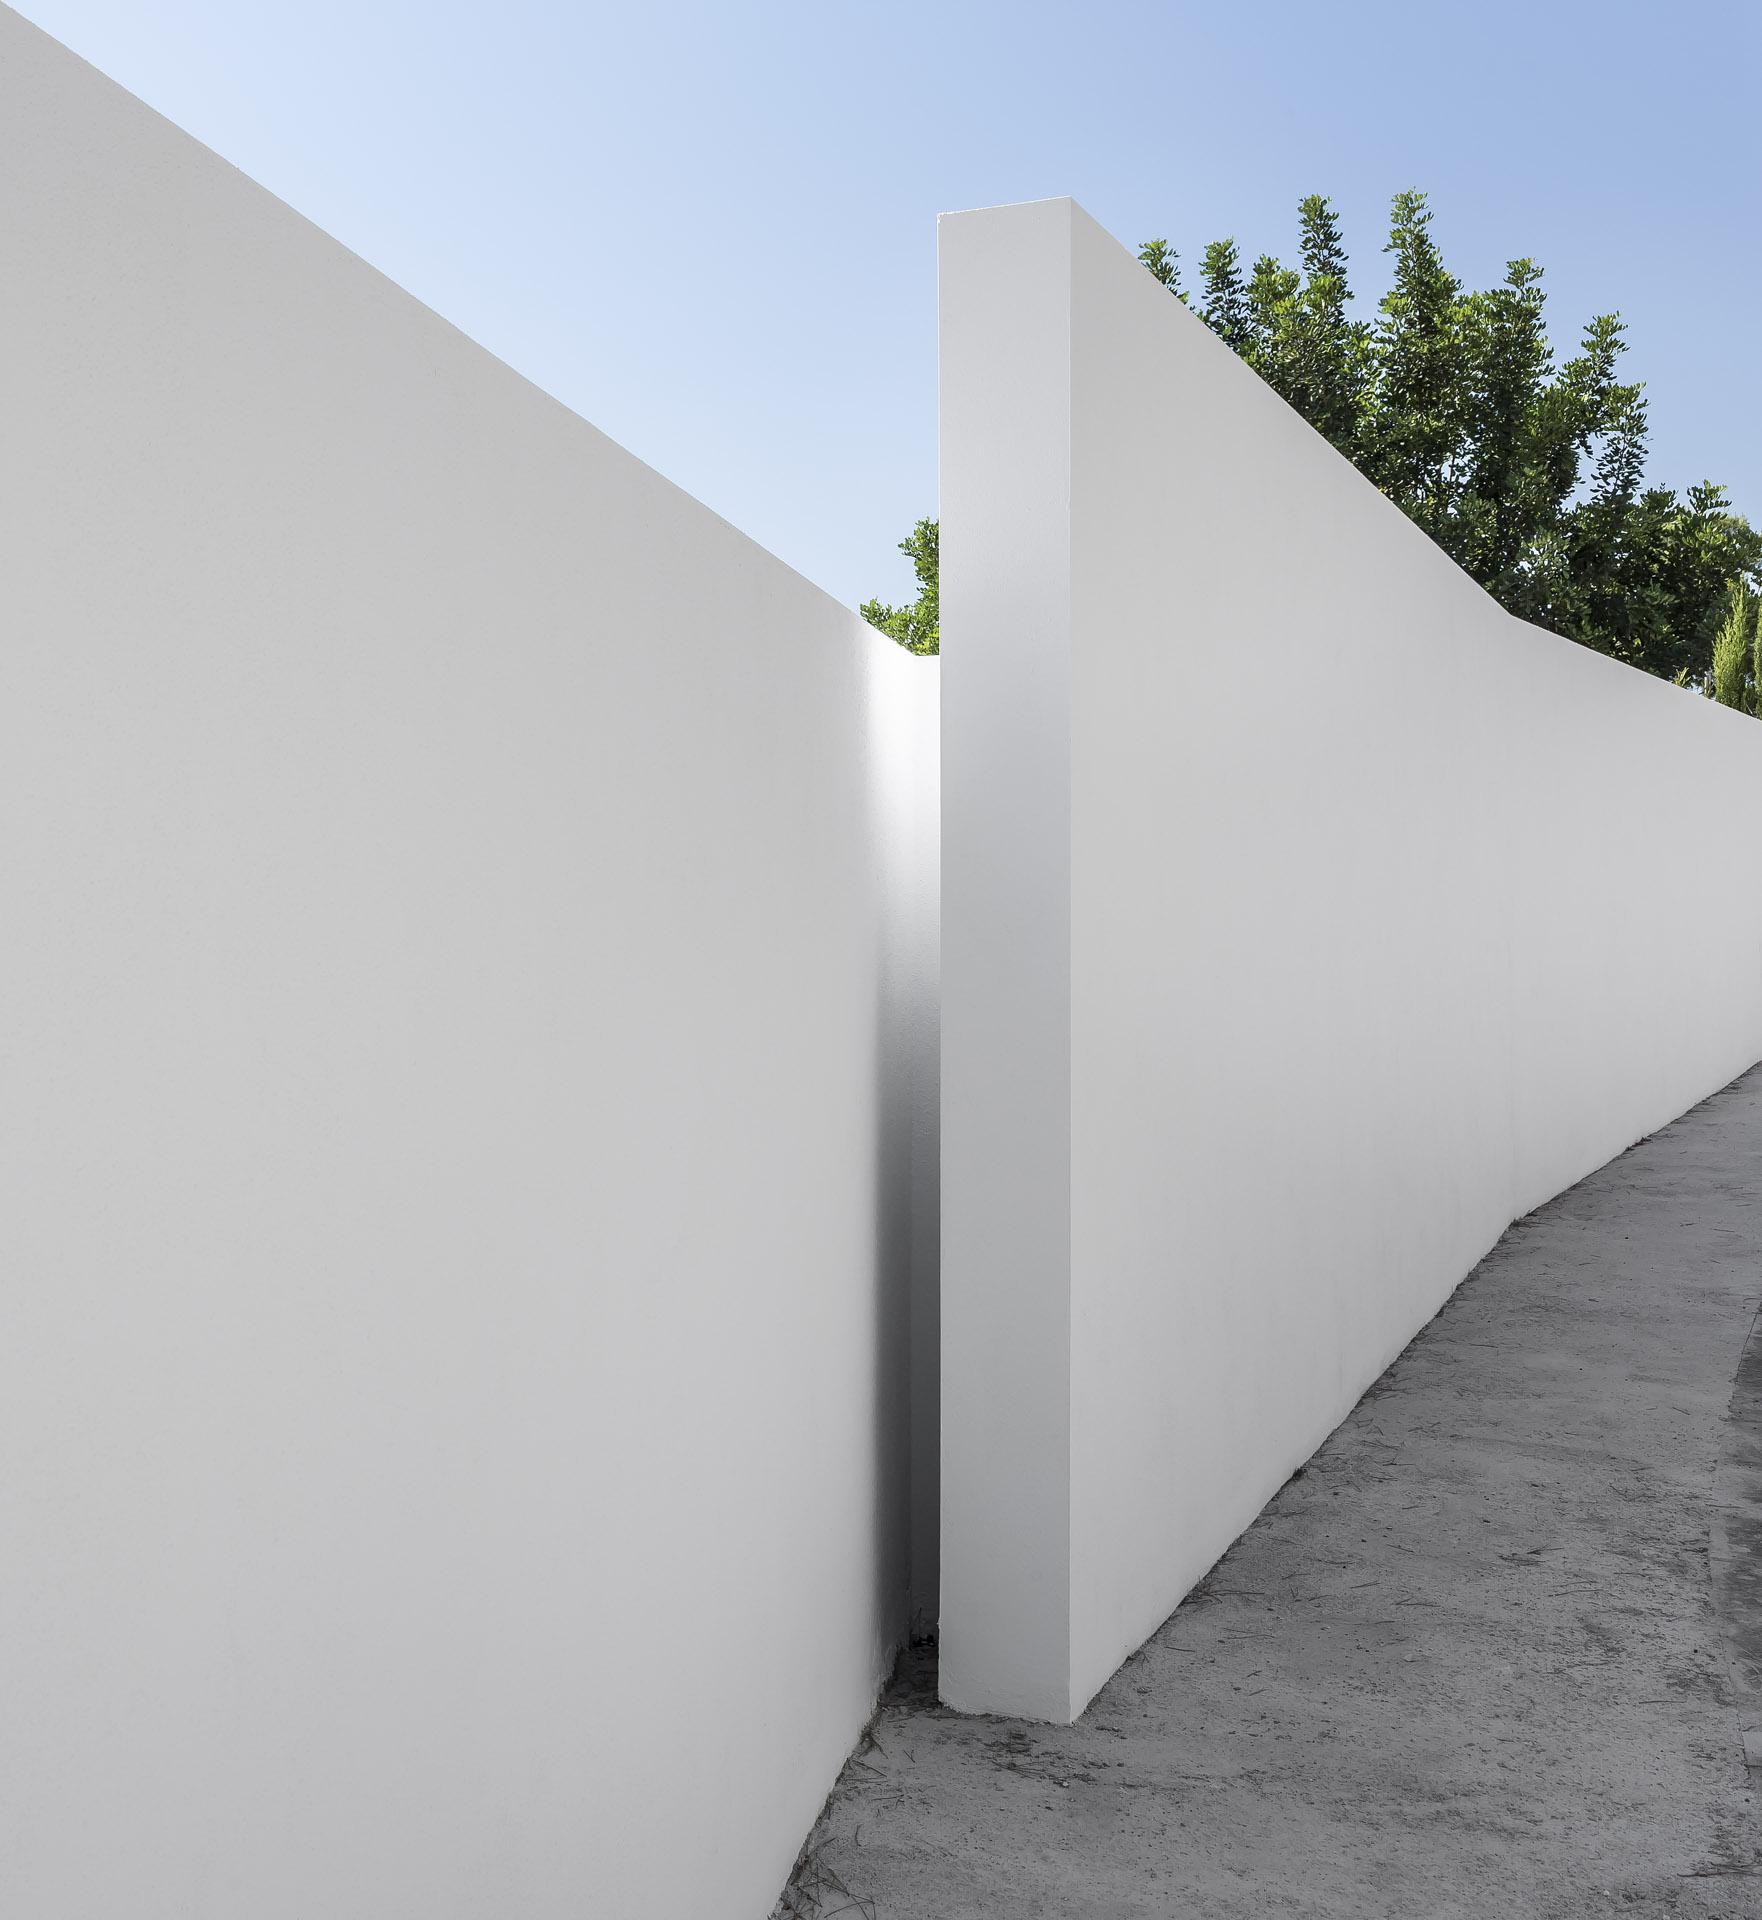 fotografia-arquitectura-valencia-german-cabo-gallardo-llopis-villamarchante-vivienda-01